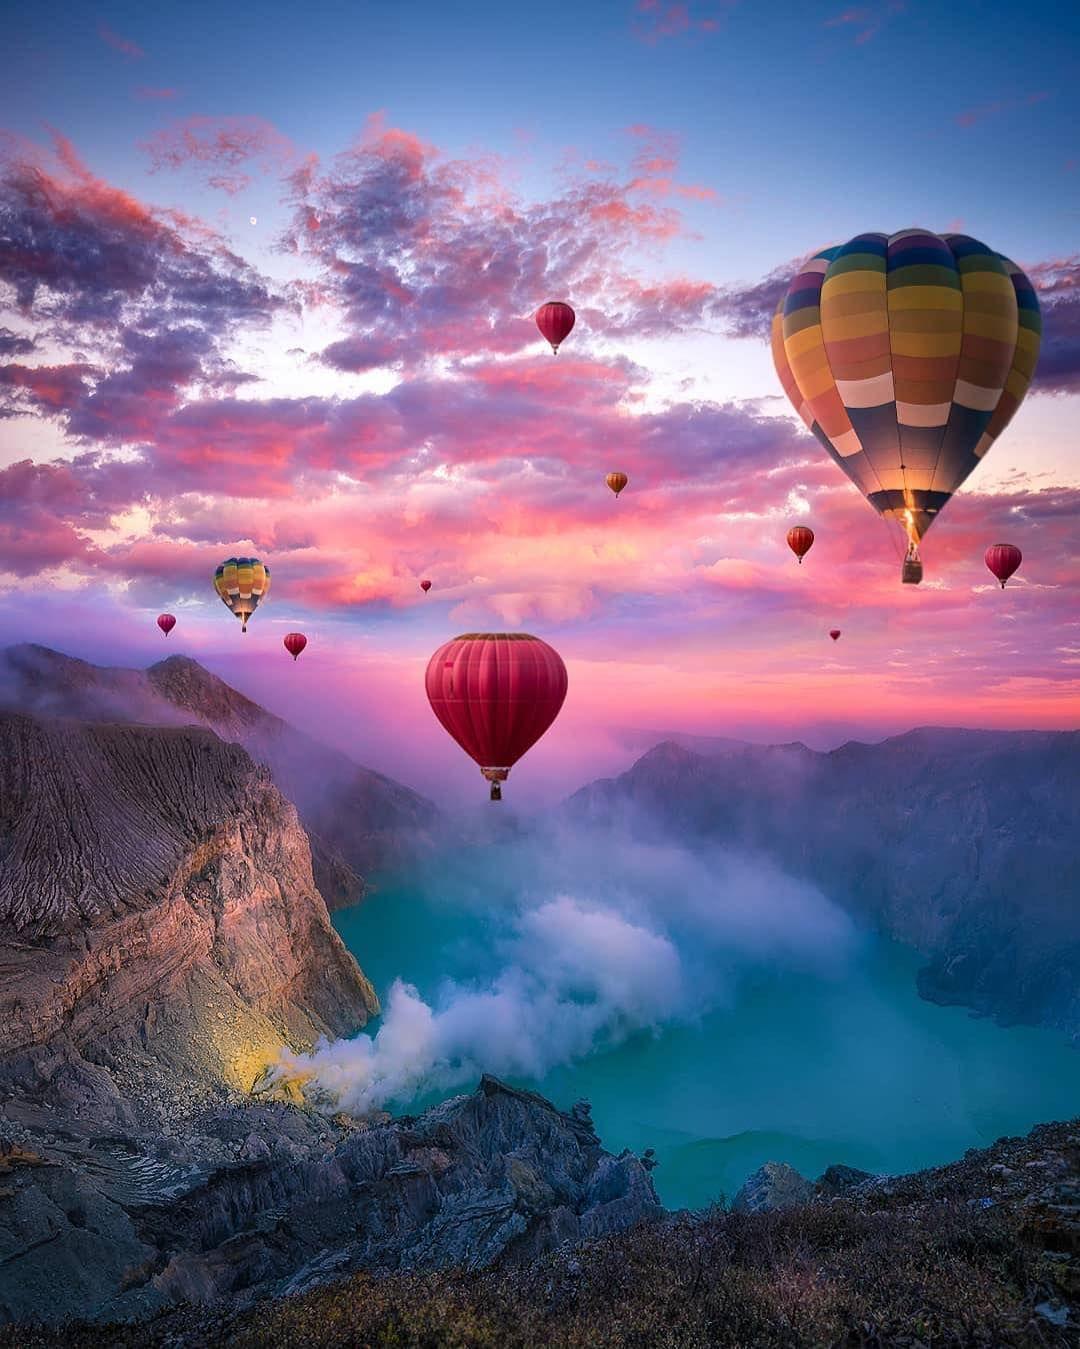 PHOT Balloons photography, Nature, Hot air balloon